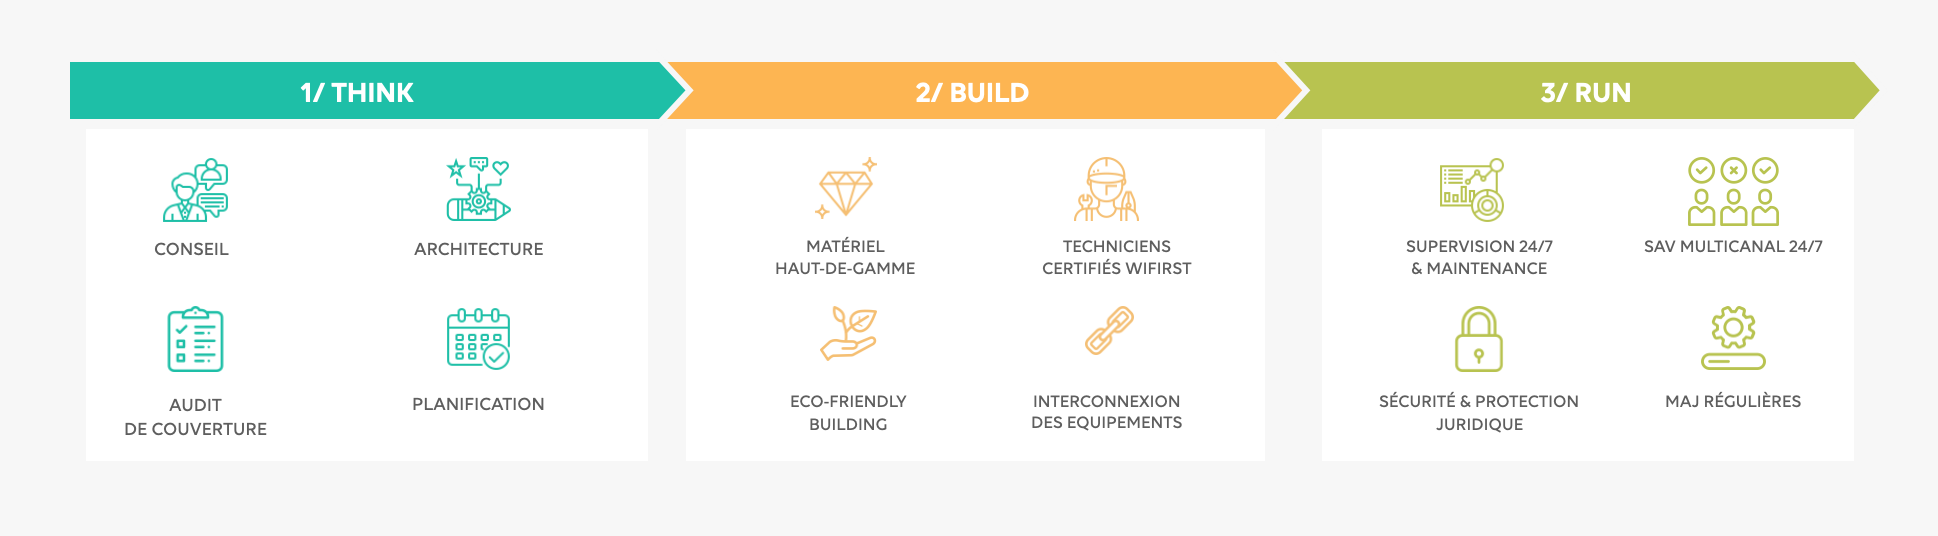 Methodologie-projet-think-build-run